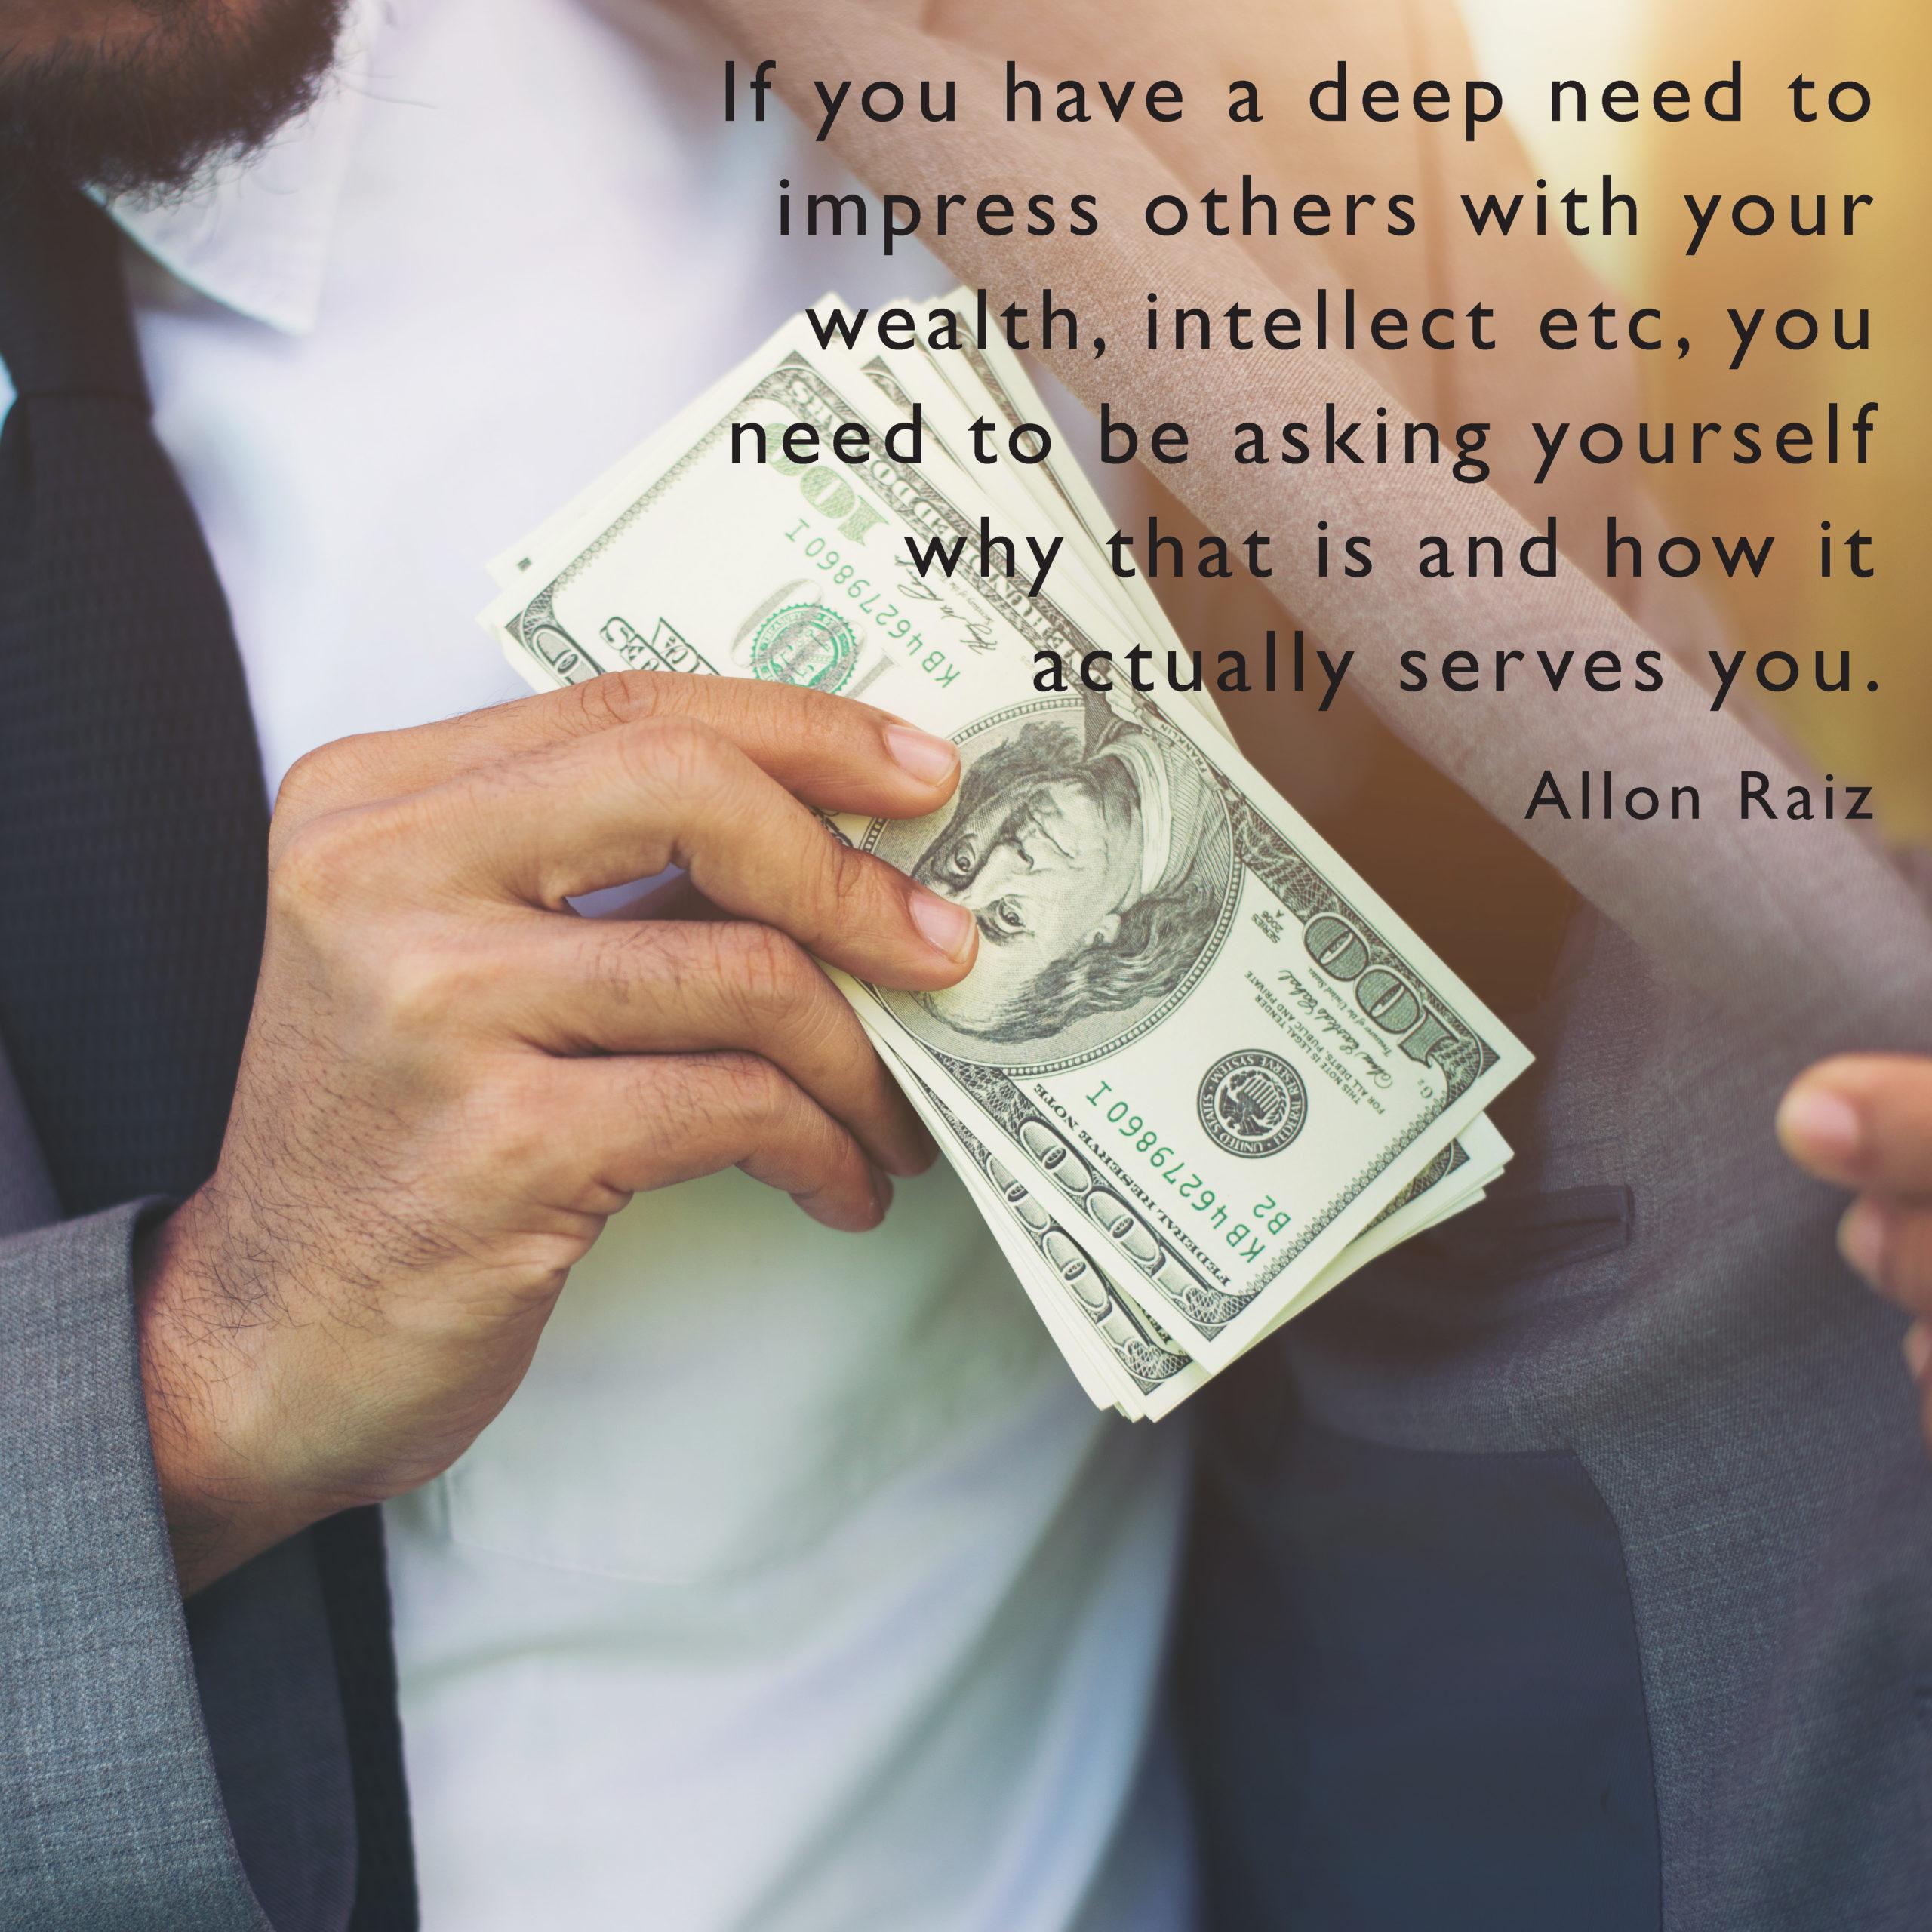 Top business incubator | Inspirational Memes By Allon Raiz